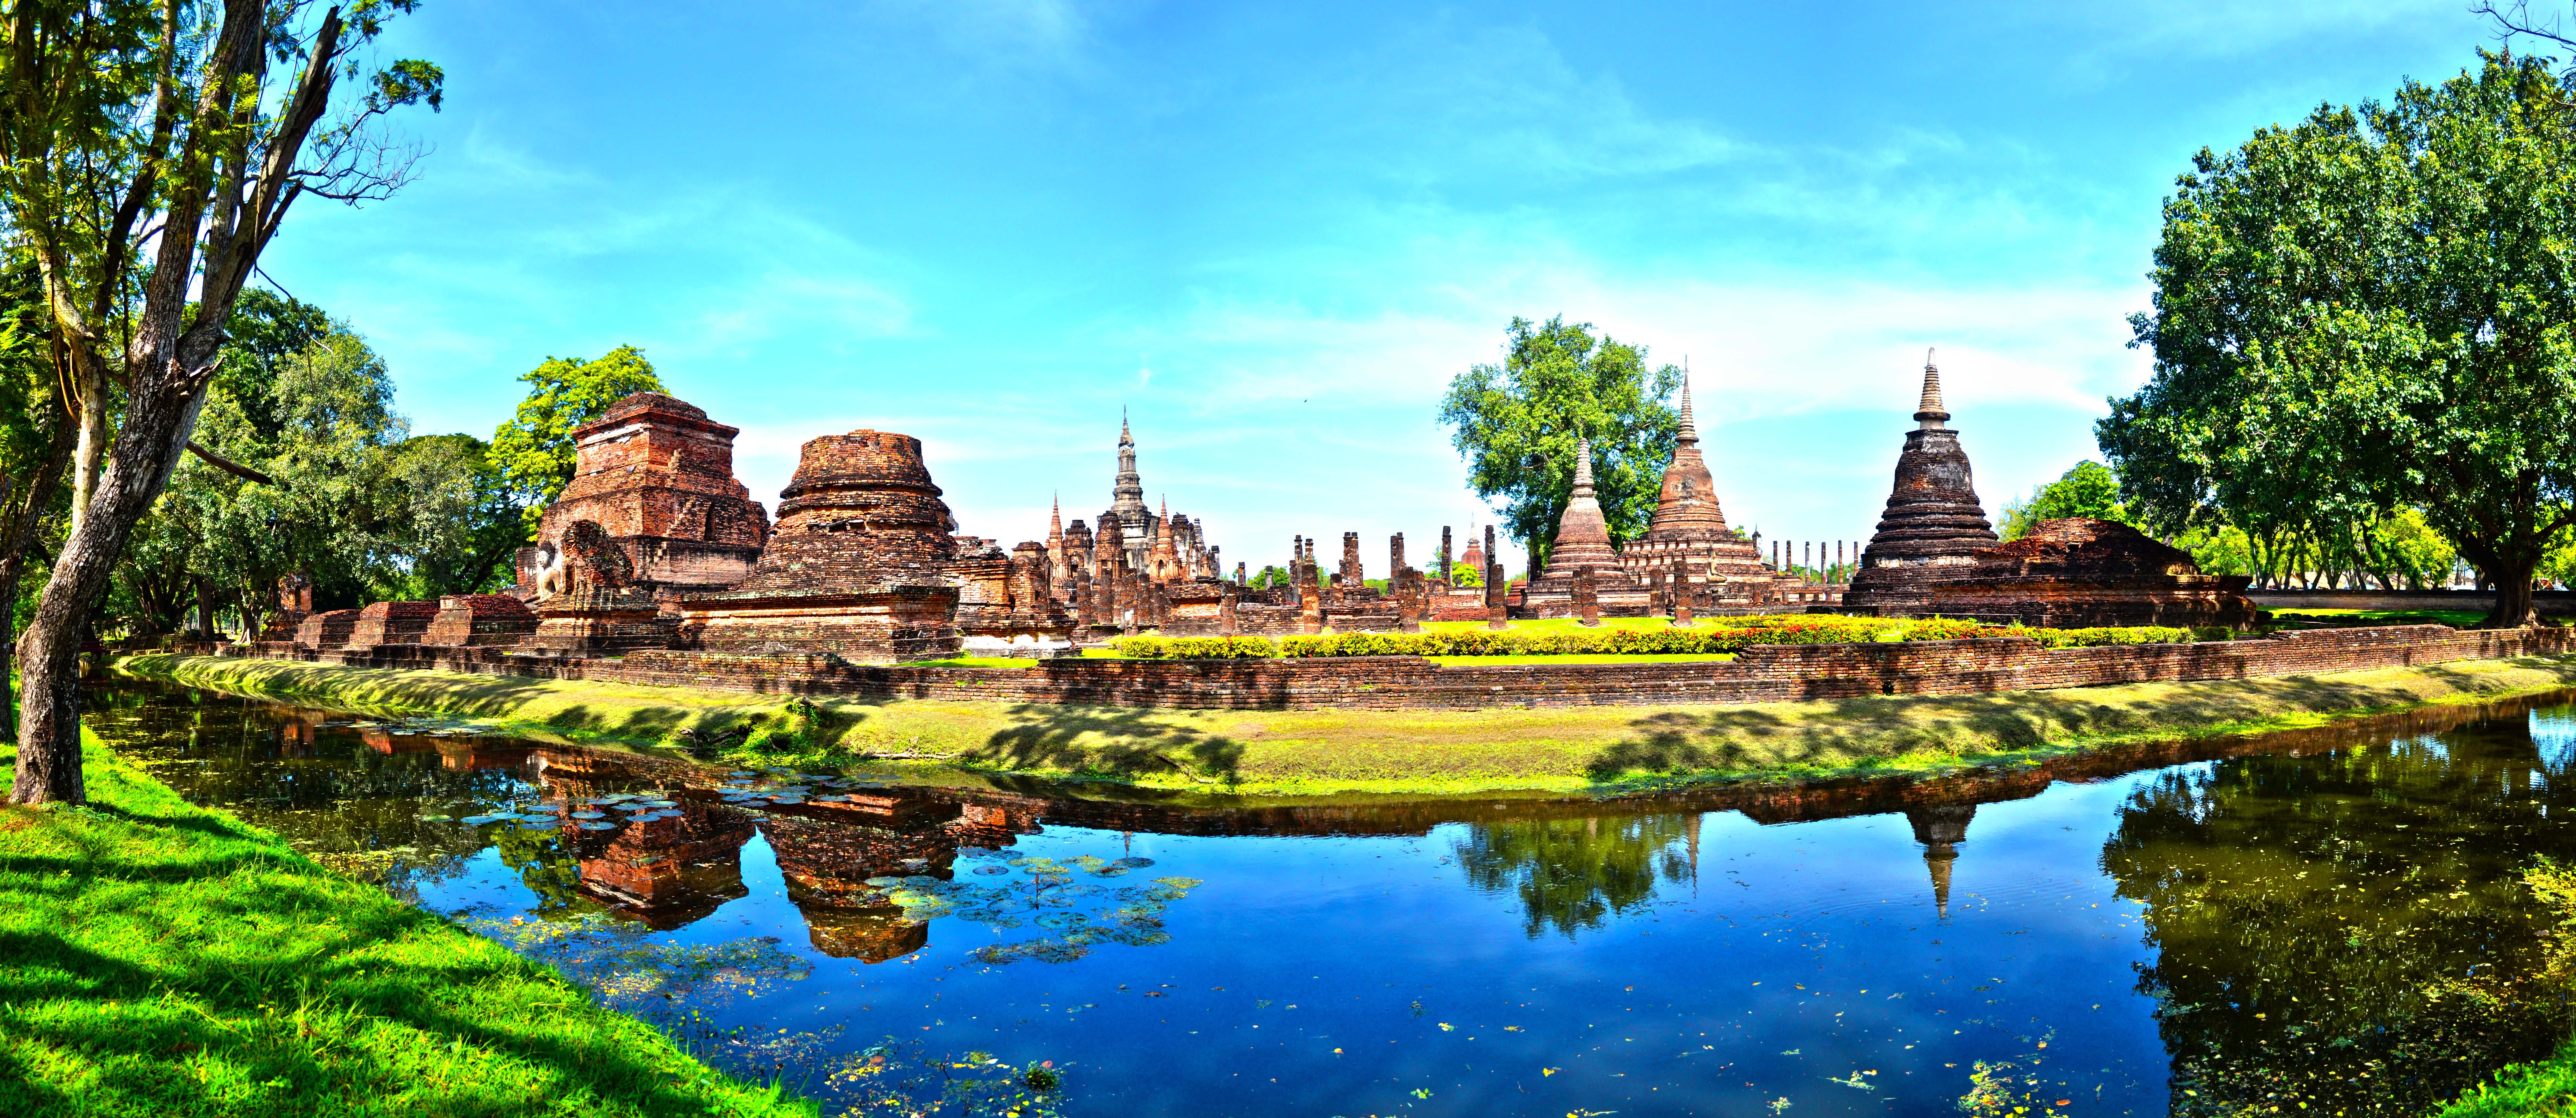 File:Wat Mahathat,Sukhothai Province.jpg - Wikimedia Commons